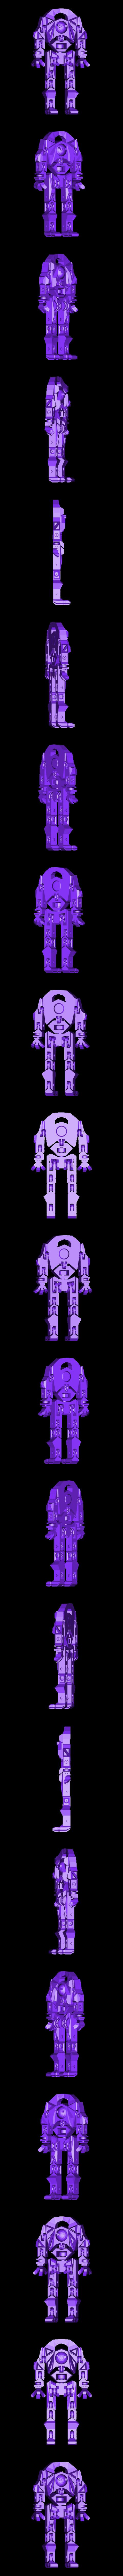 Robot_A14loose.stl Download free STL file Robotta • 3D printer template, ykratter